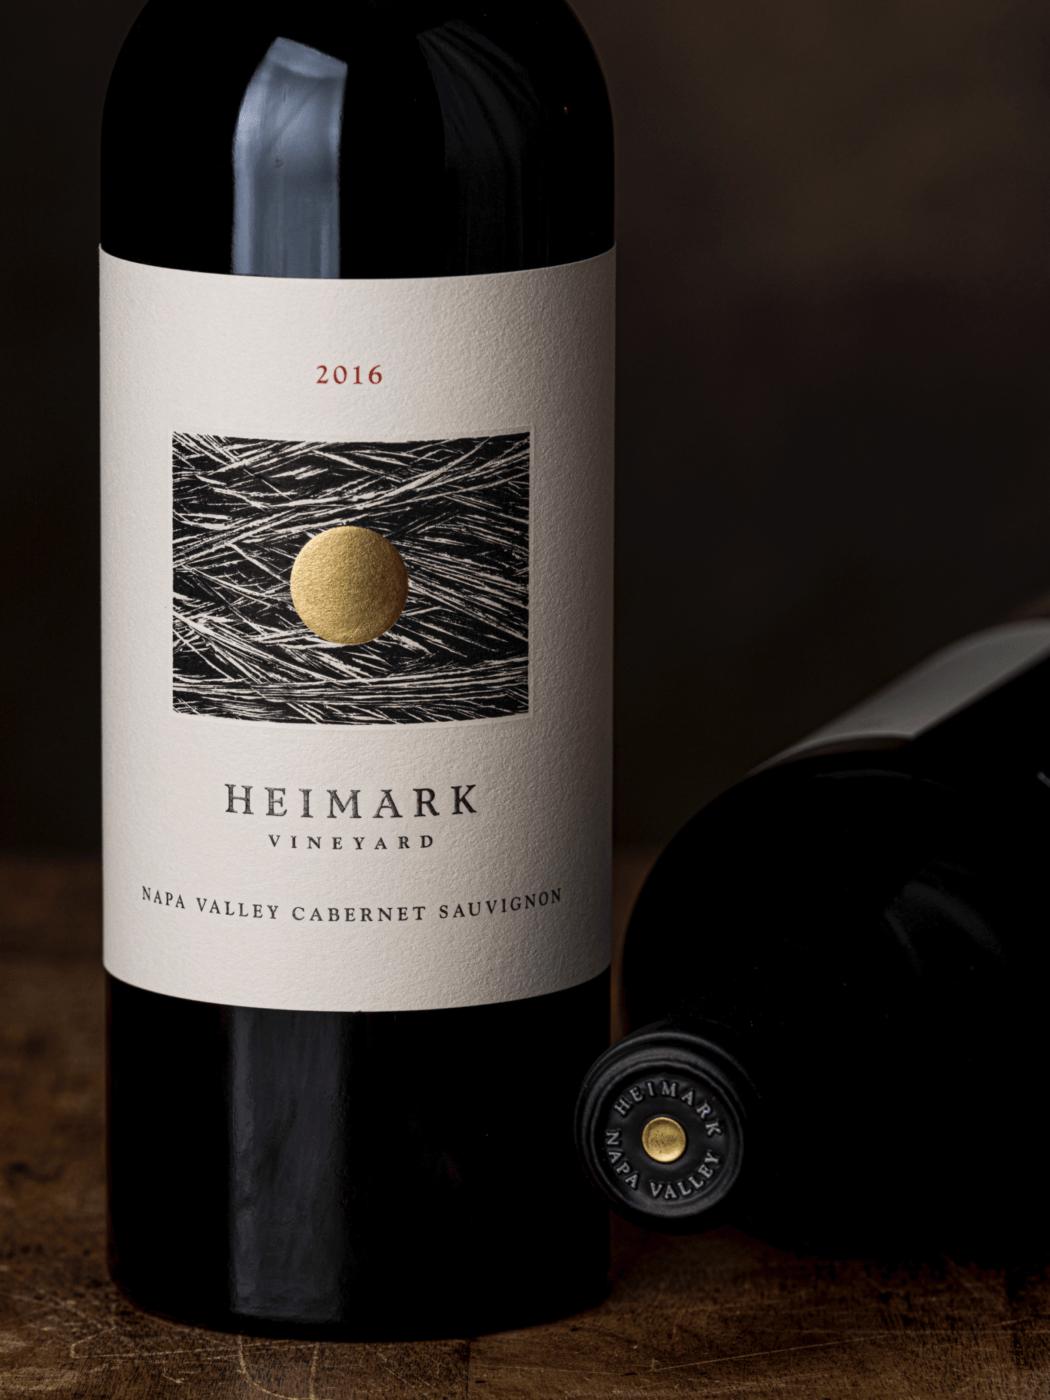 Heimark 2016 Cabernet Sauvignon